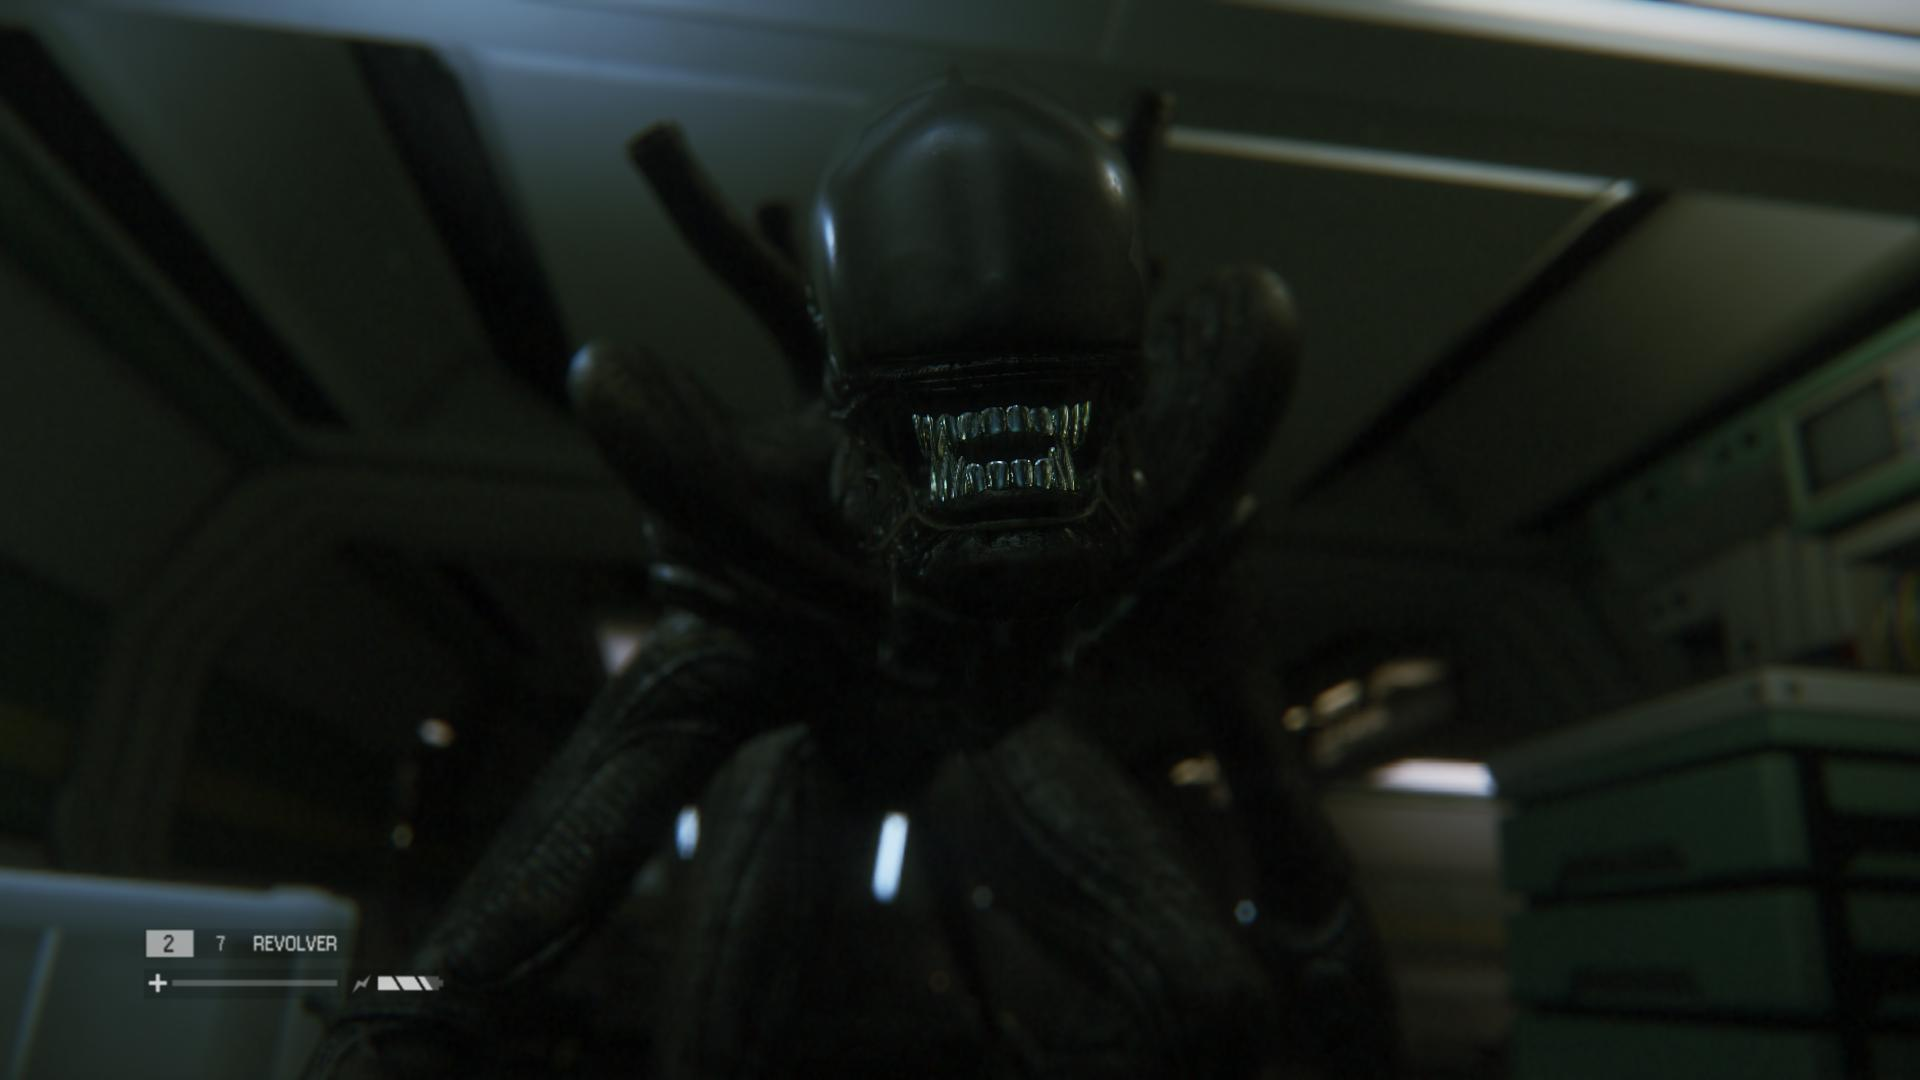 Recenze Alien: Isolation - Patnáct hodin v izolaci 9610